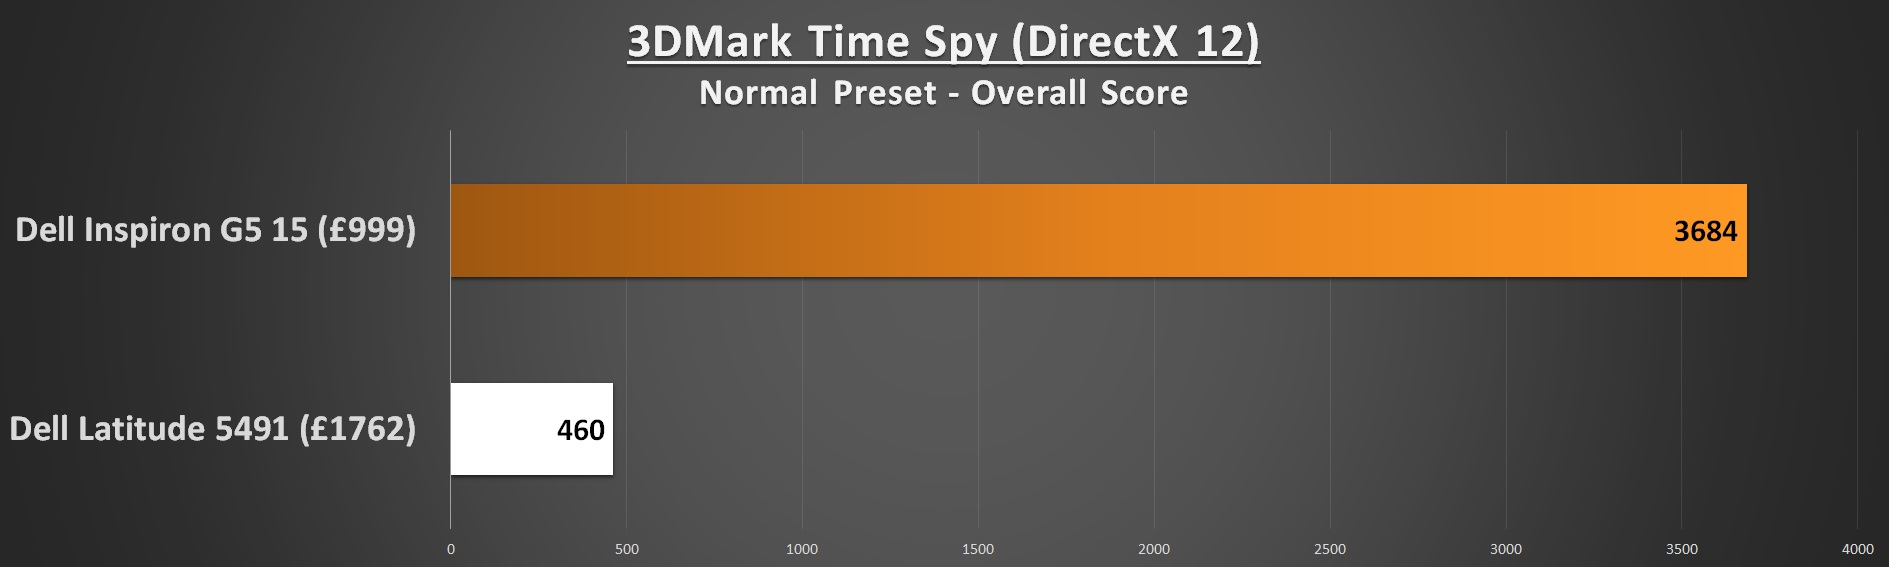 Dell Lattitude 5491 Performance 3DMark Time Spy